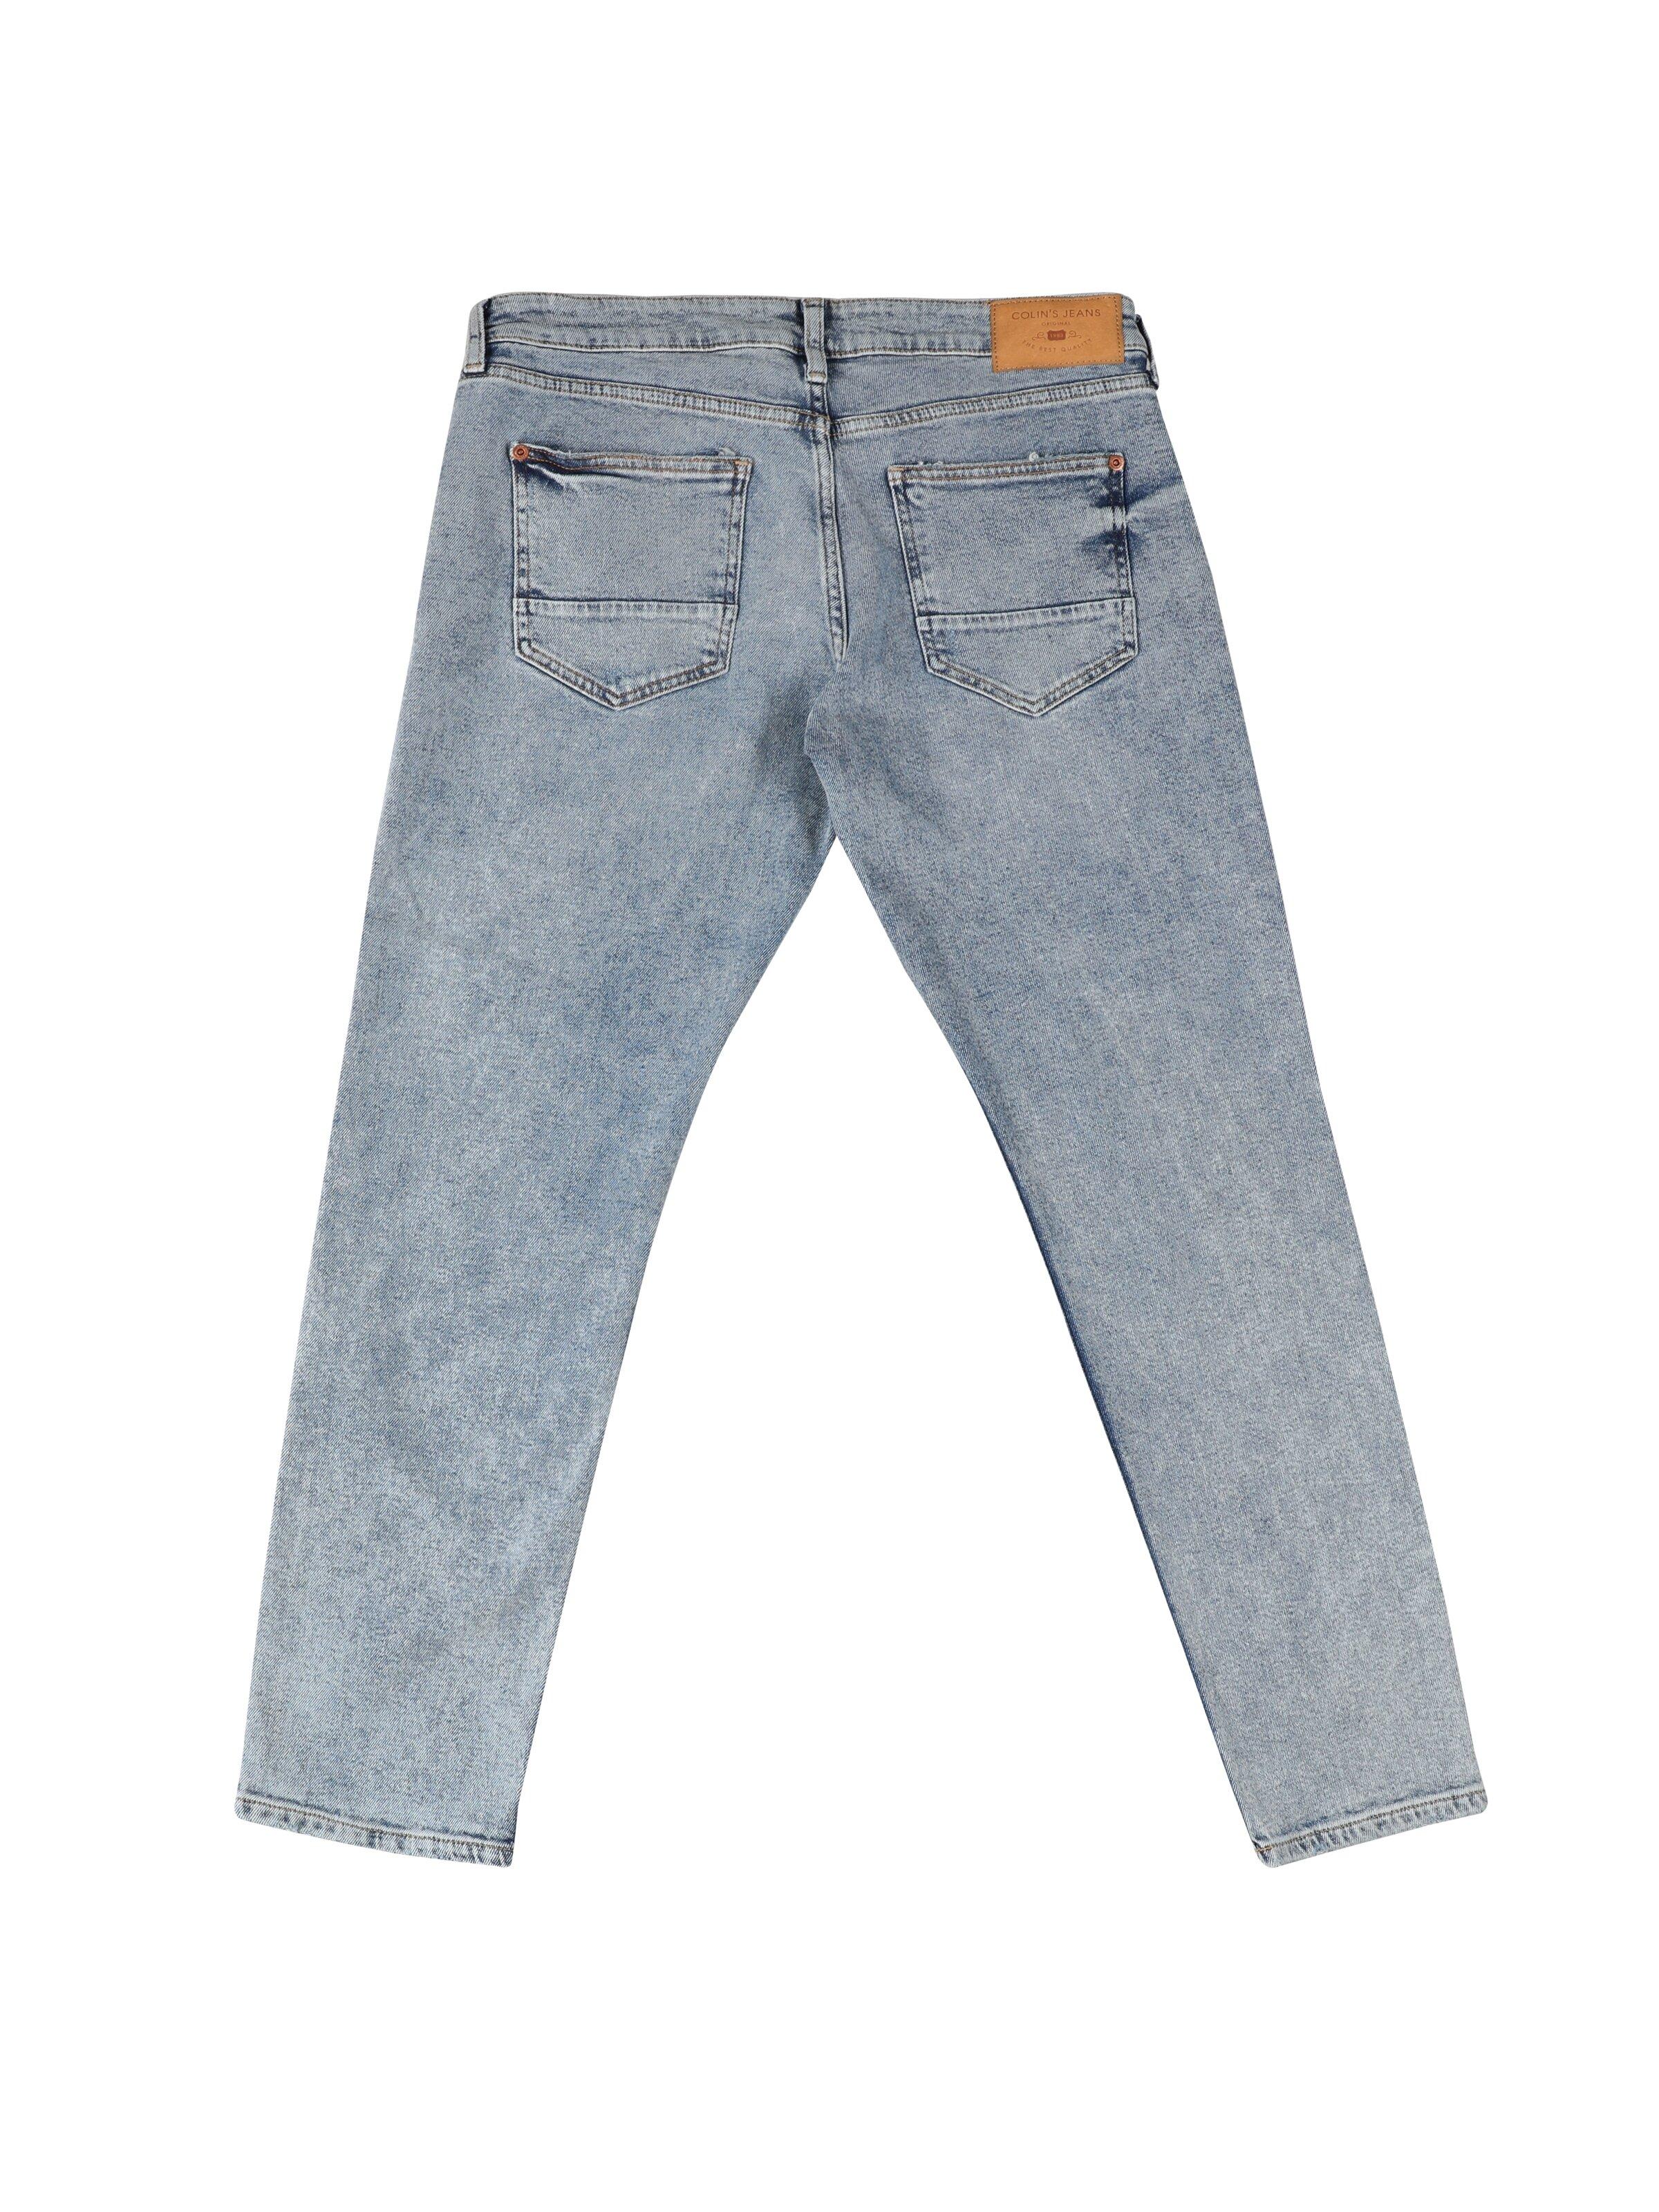 039 Lucas Carrot Fit Düşük Ağ Crop Leg  Erkek  Jean Pantolon